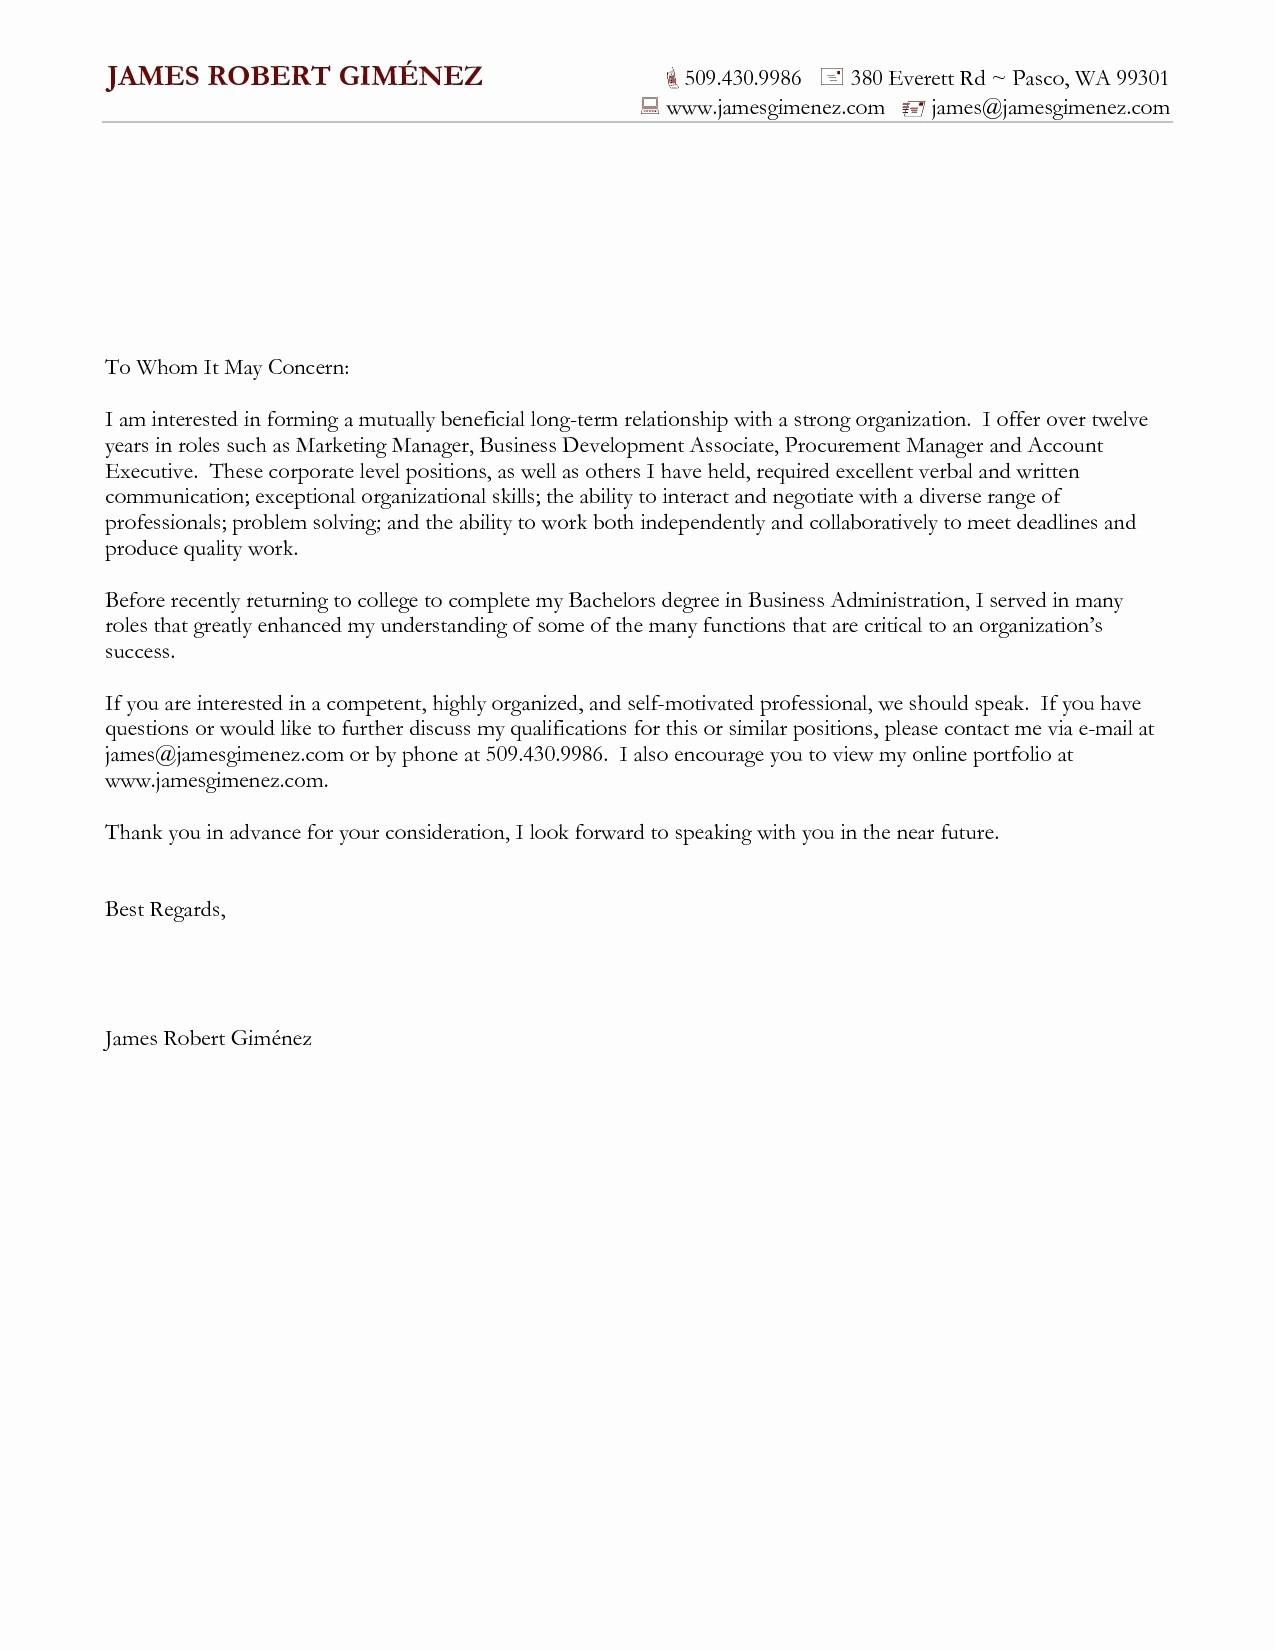 Cover Letter Of A Resume Elegant Mock Cover Letter